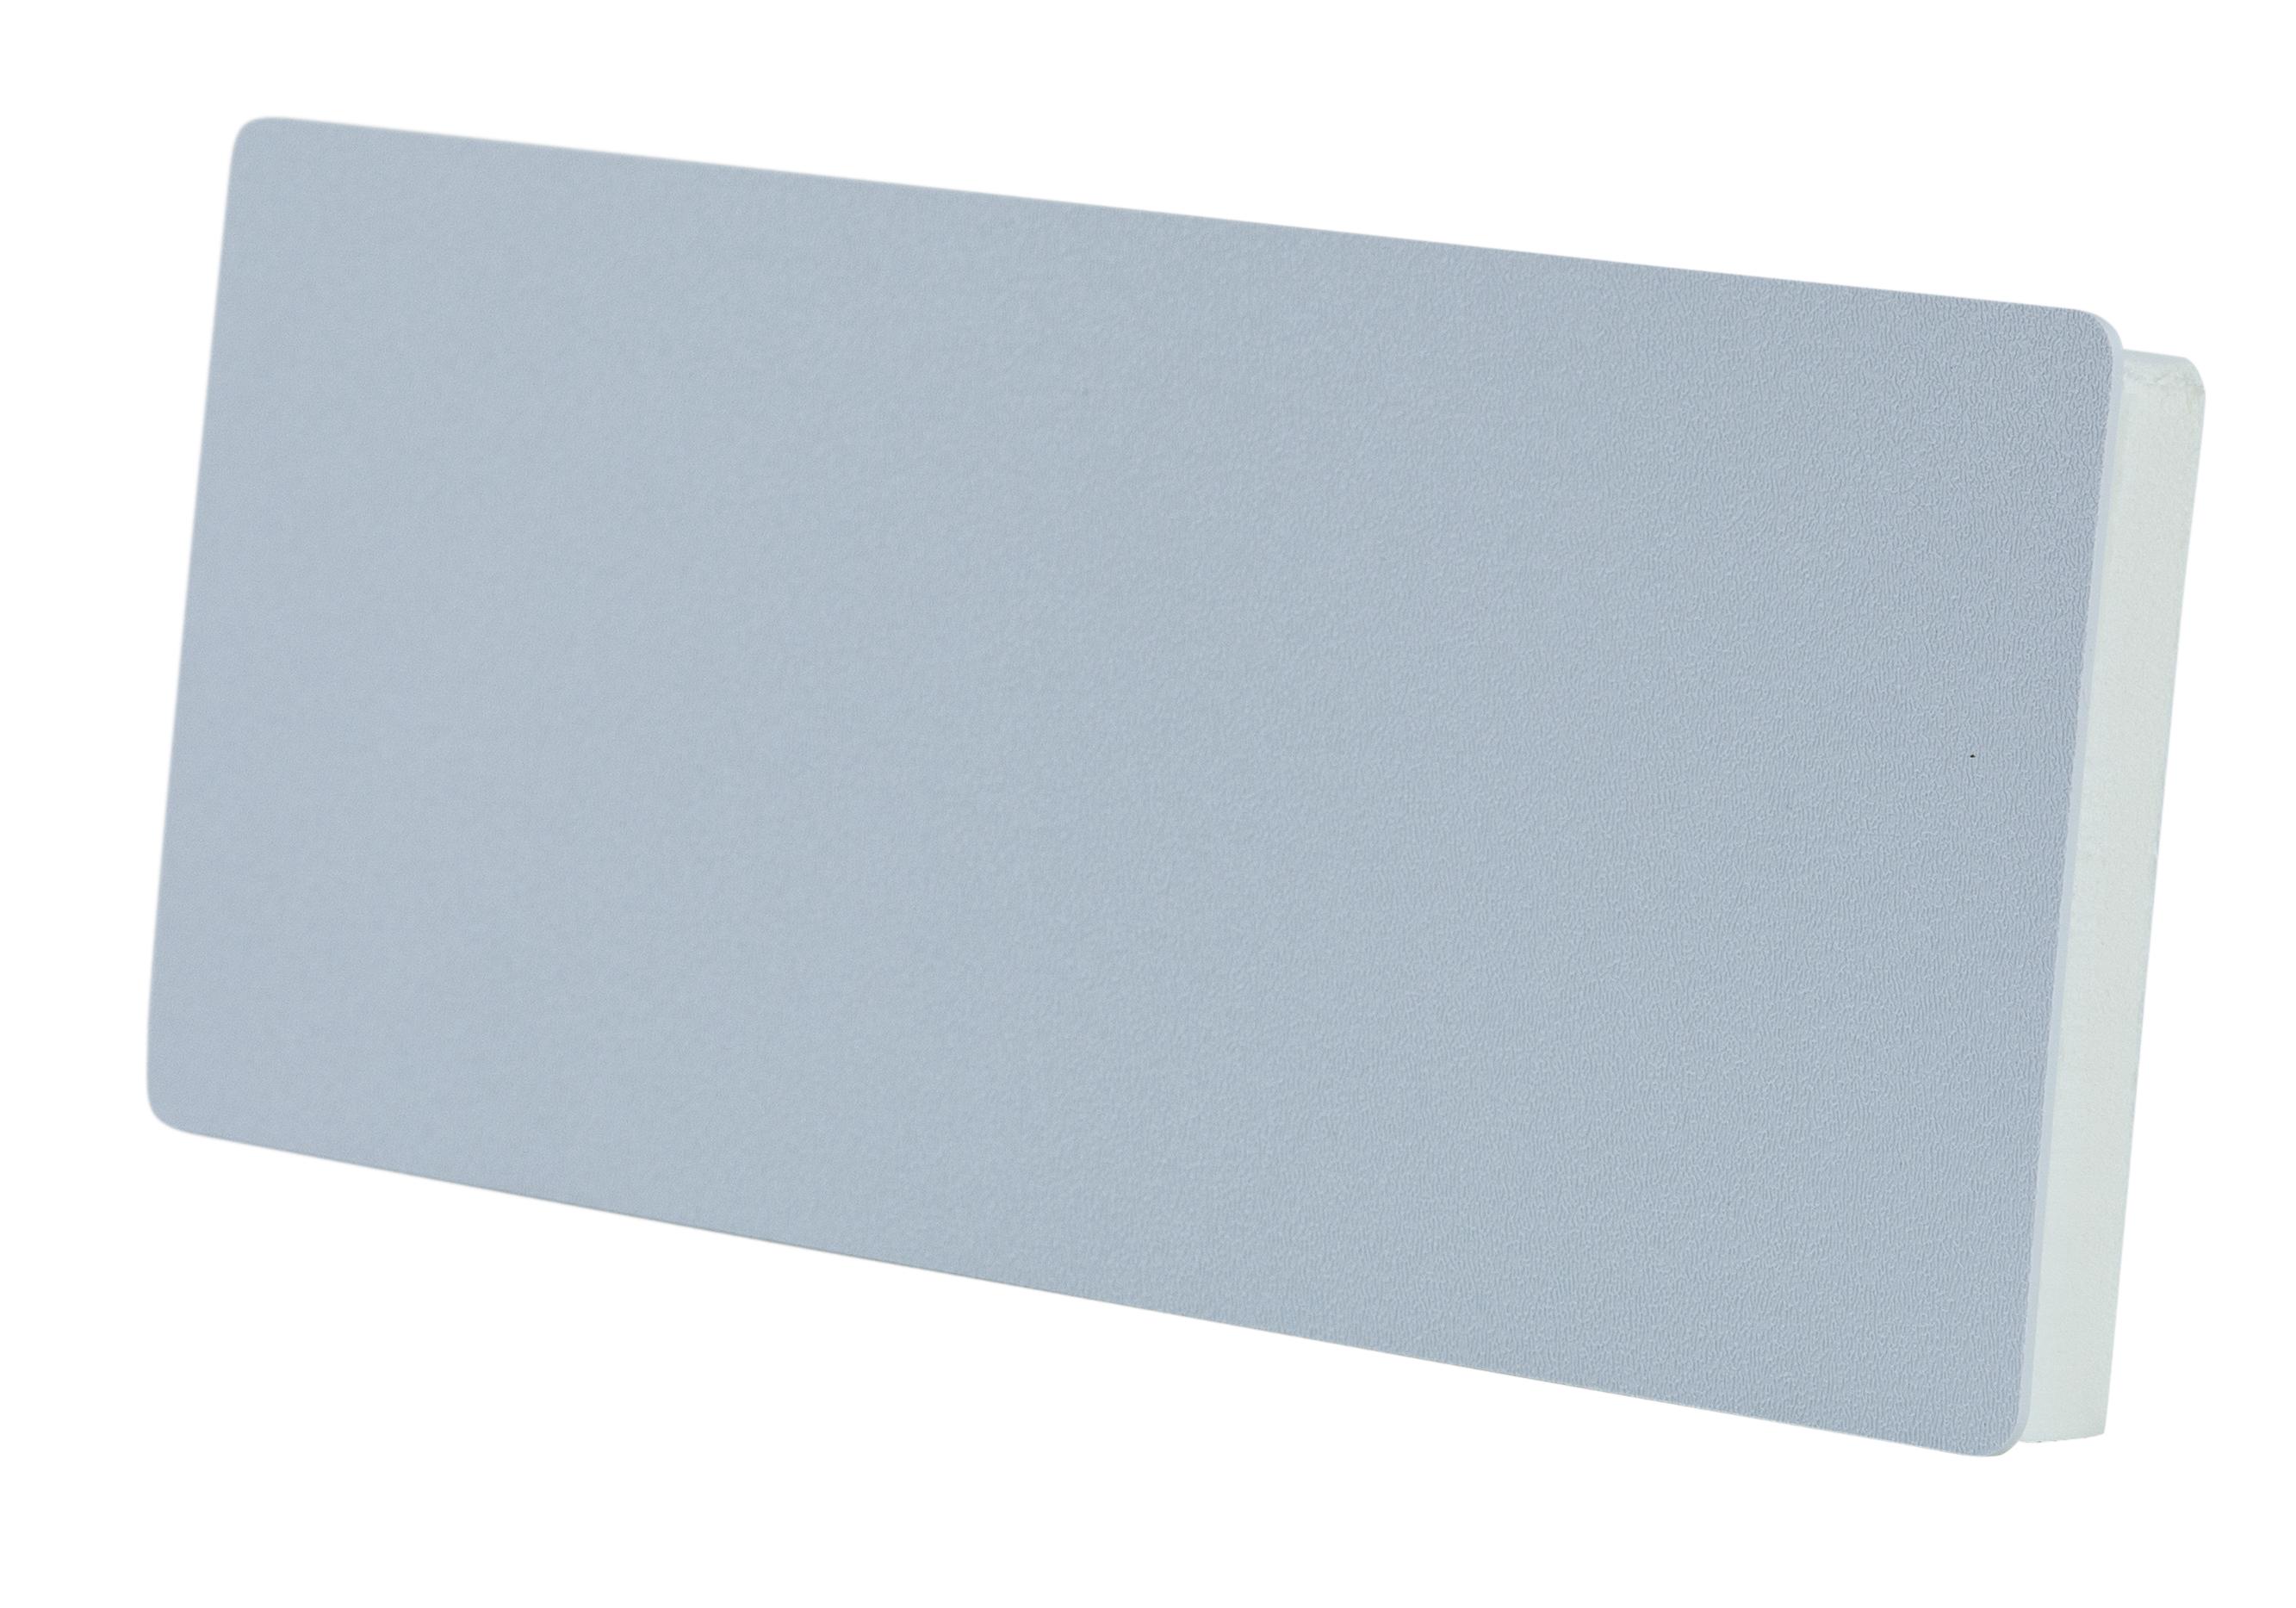 Skimmer Plug For Hydrotools 8939 Widemouth Skimmer